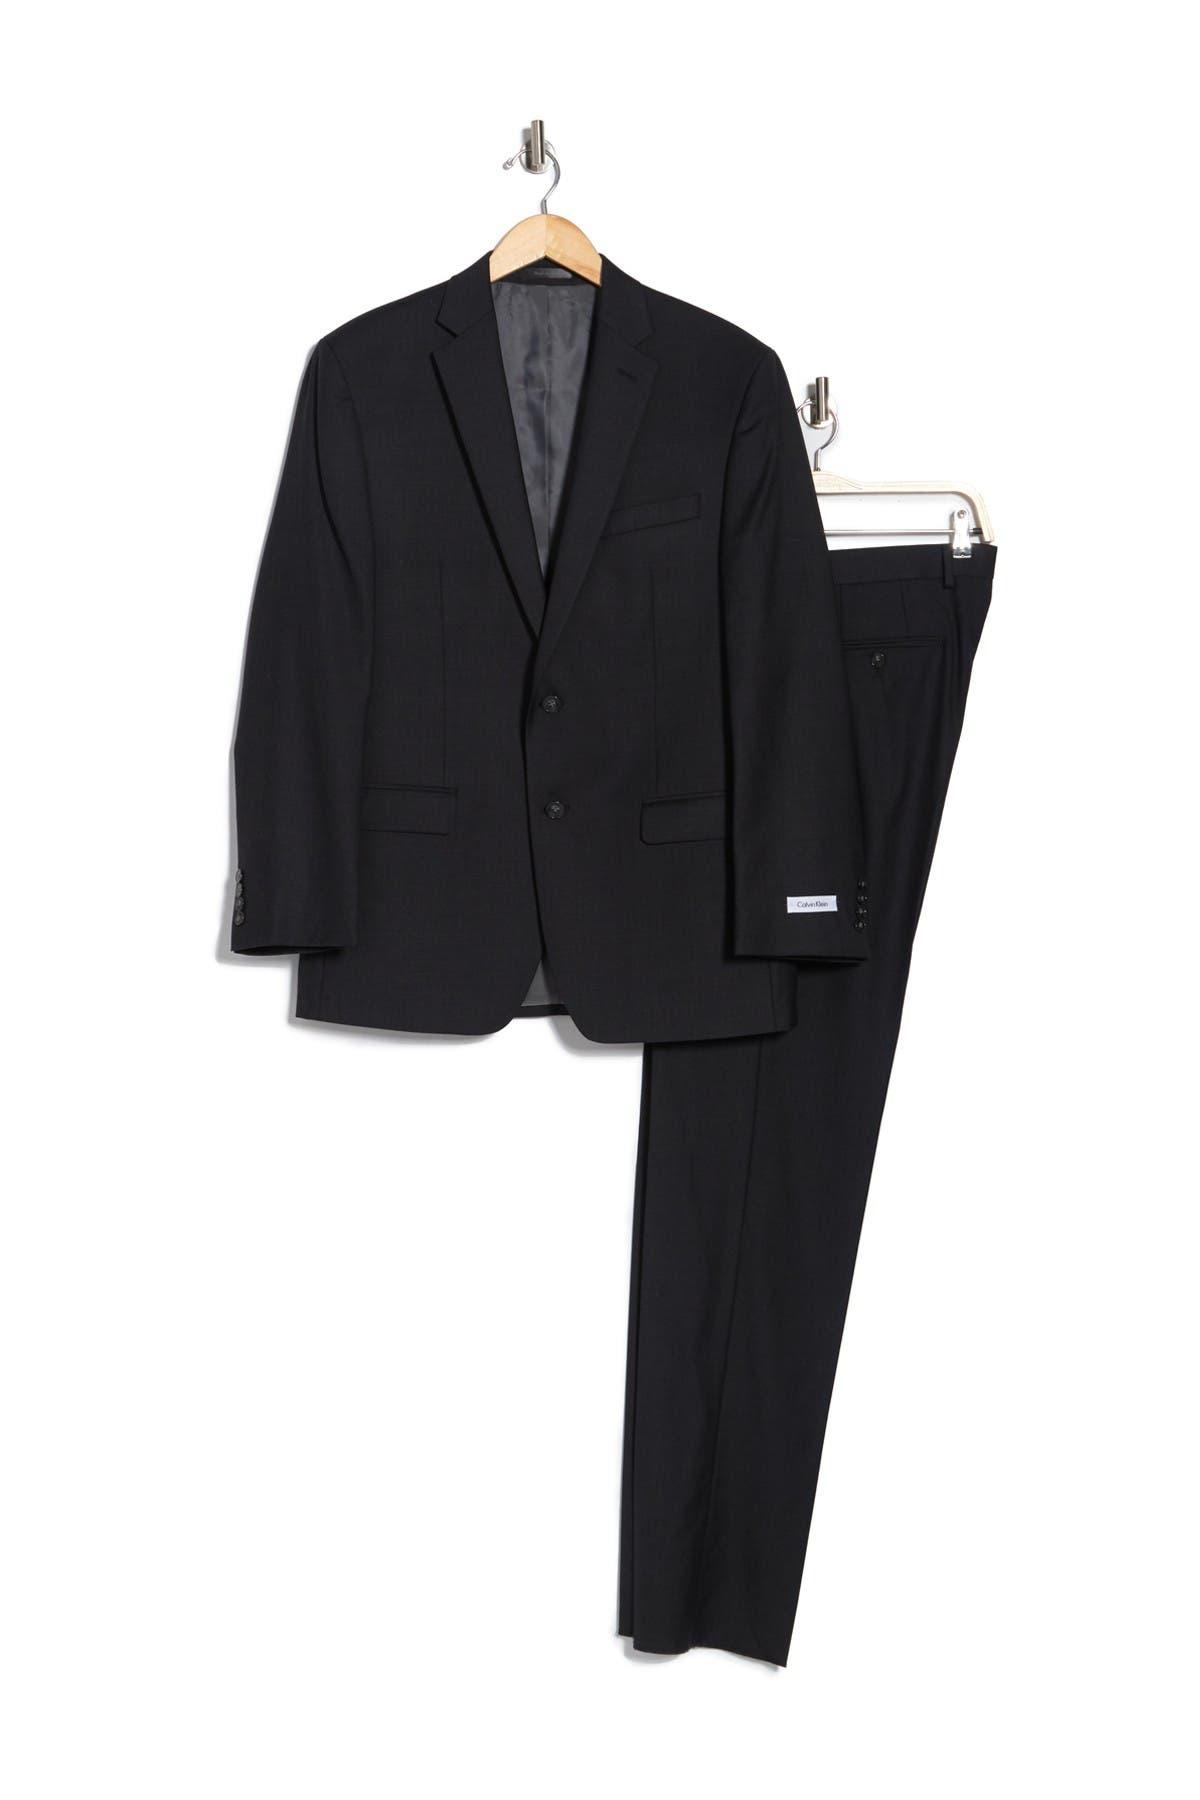 Image of Calvin Klein Black Two Button Notch Lapel Wool Suit